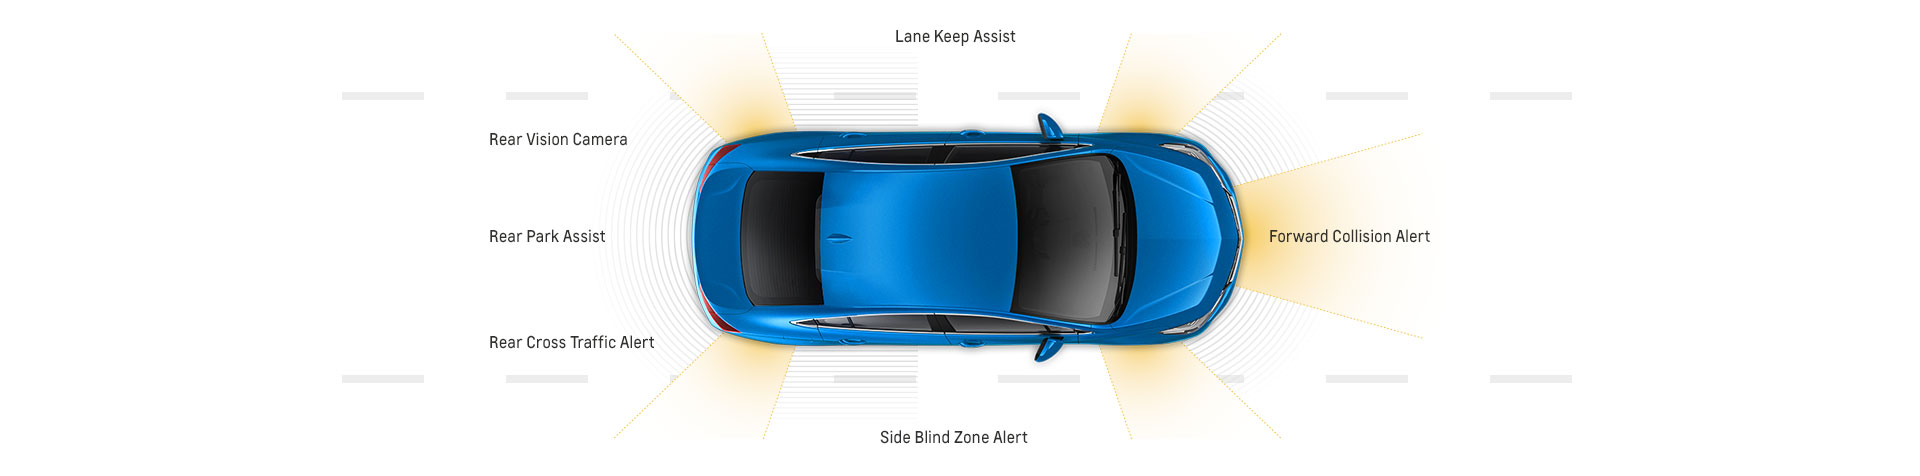 2017-chevrolet-cruze-compact-car-mo-safety-1920x476-01